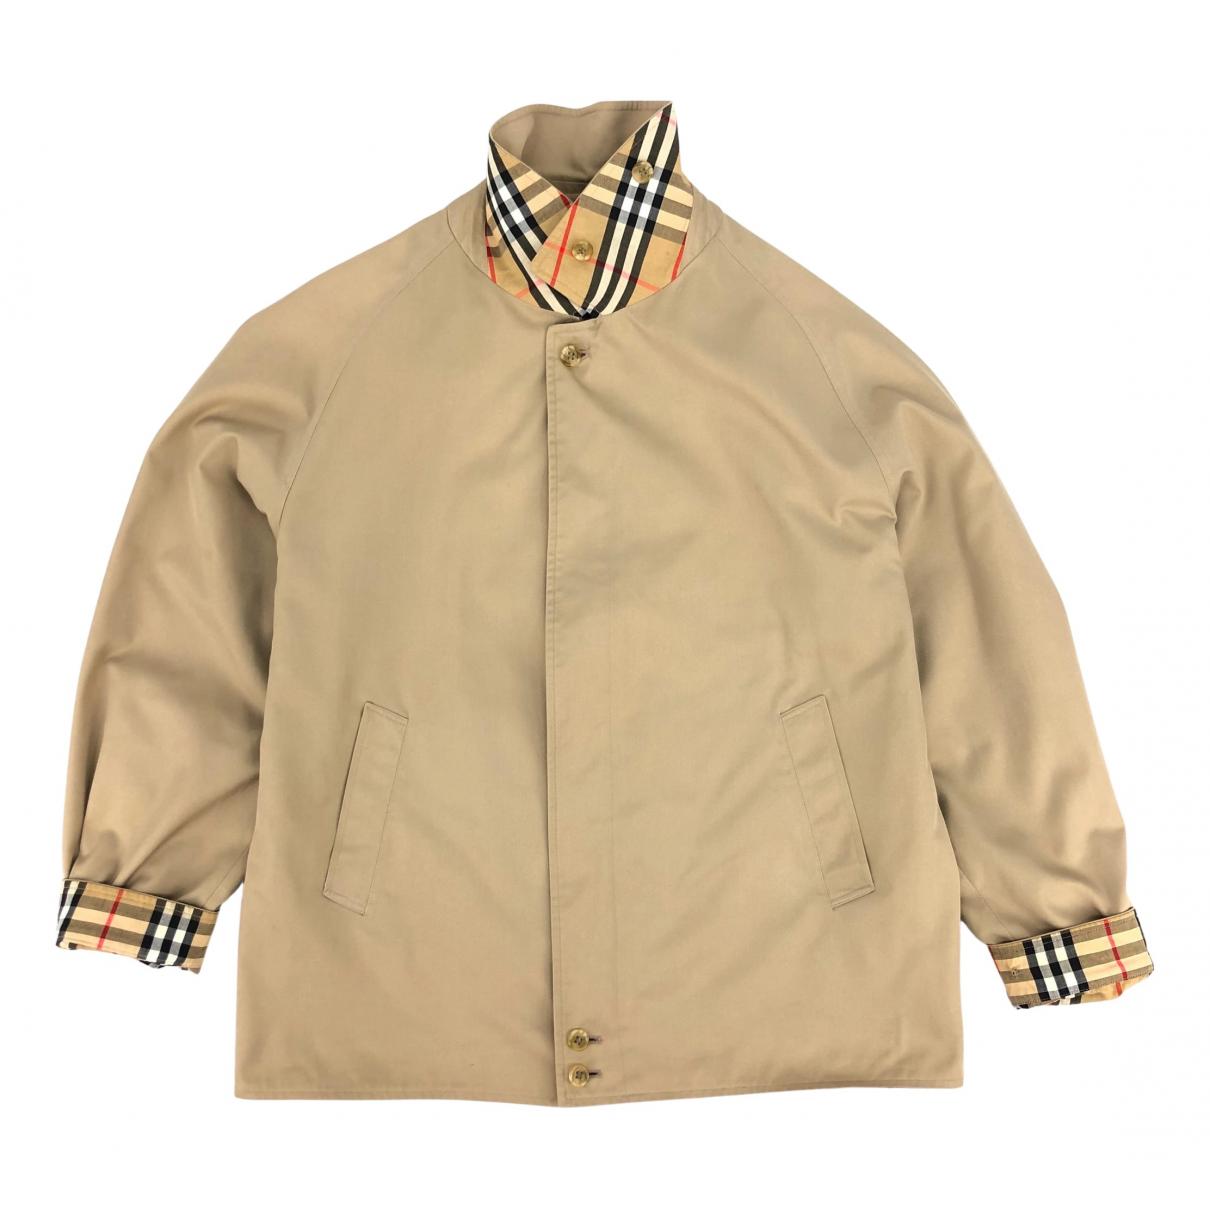 Burberry \N Beige Cotton jacket  for Men XL International